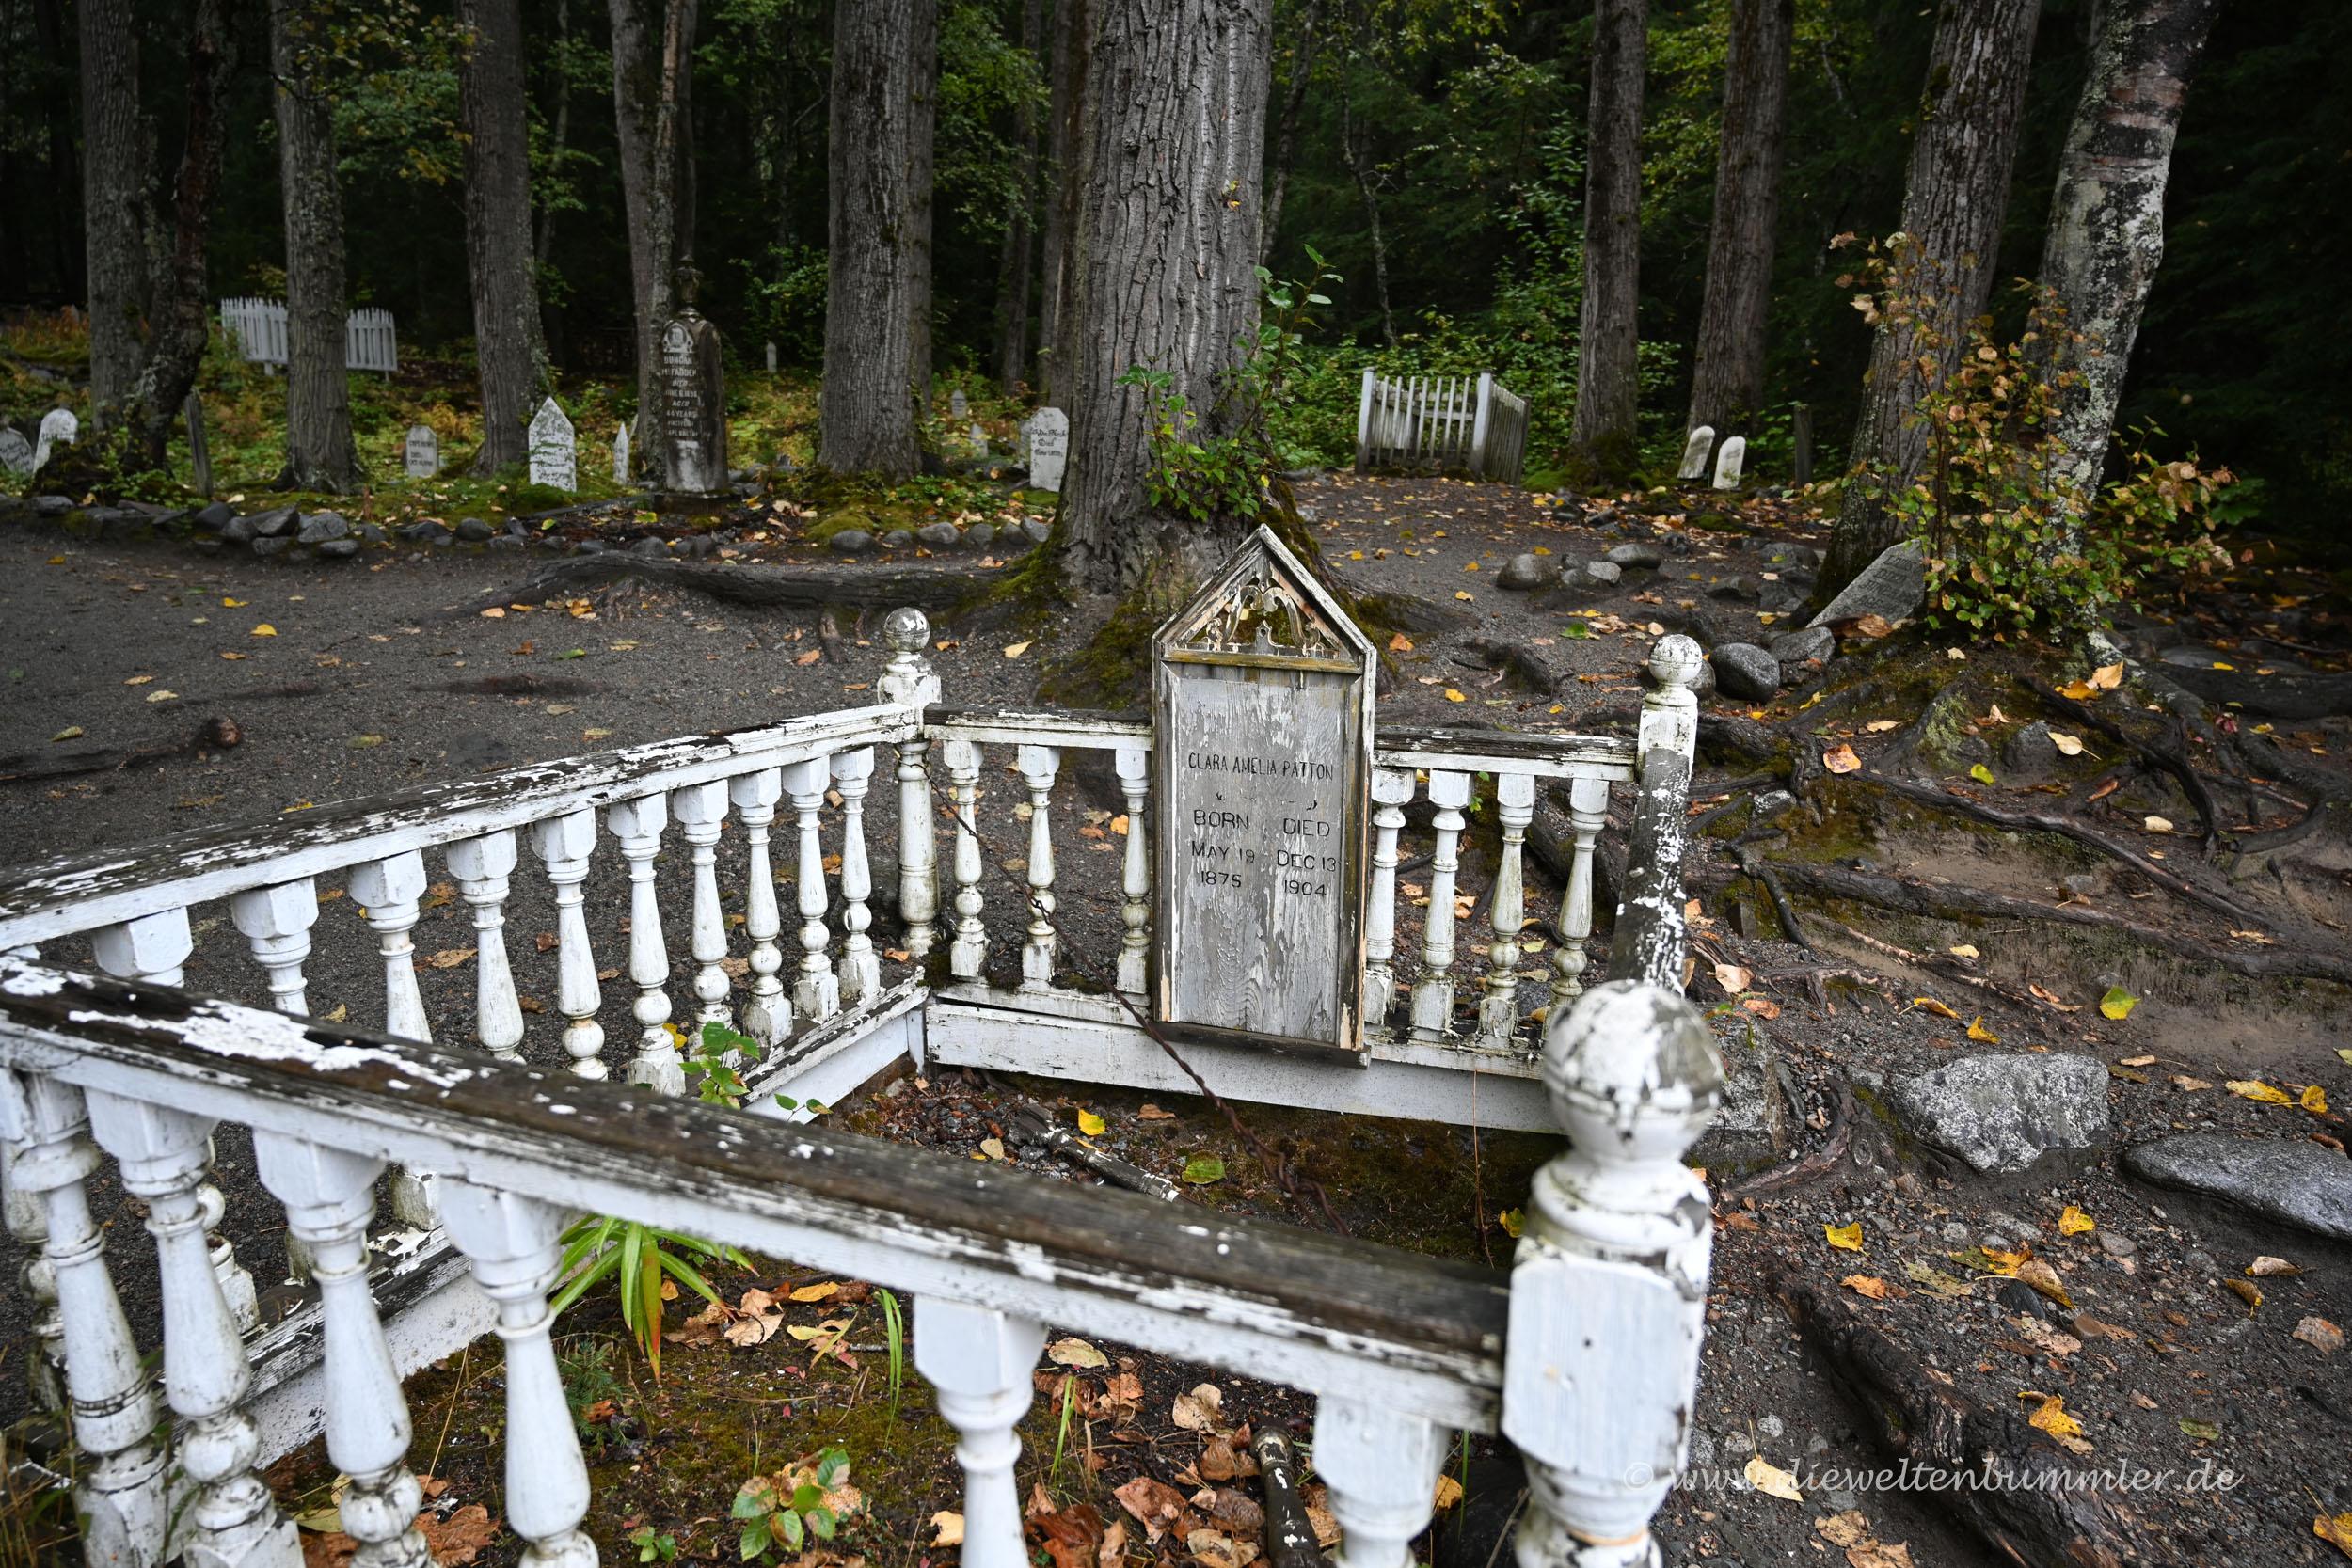 Friedhof mit Goldgräbern